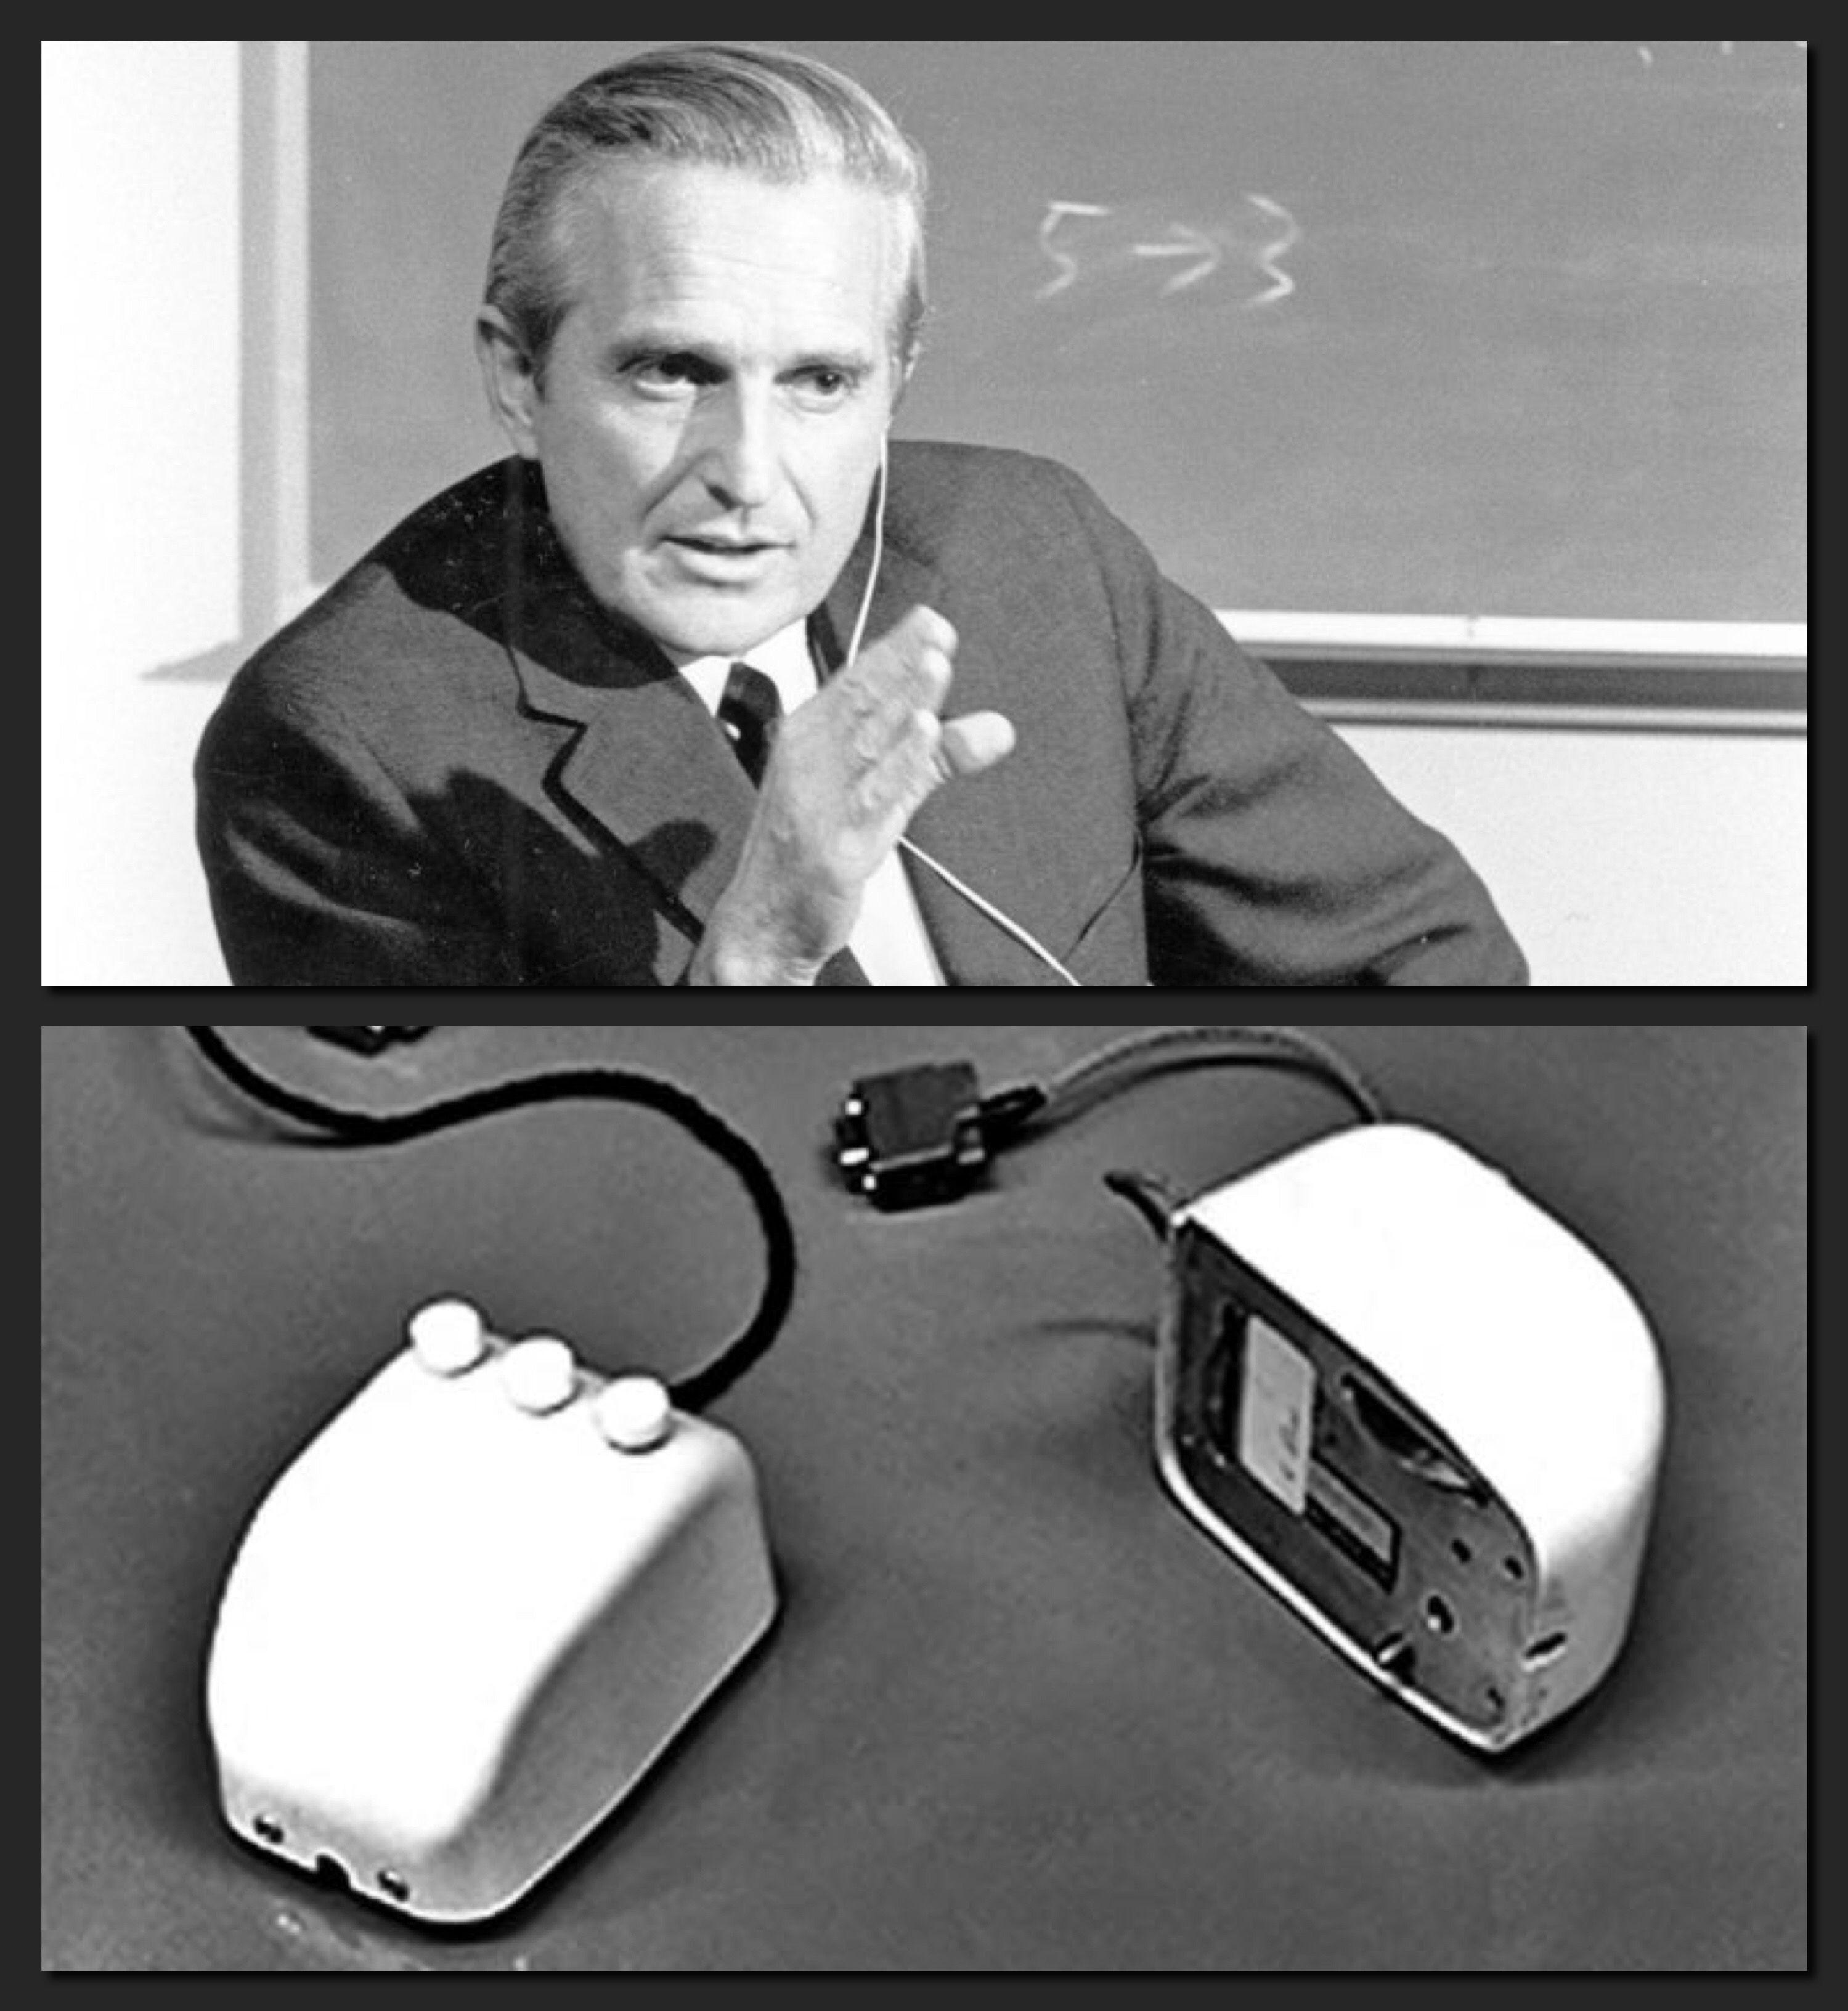 Douglas-inventor do rato